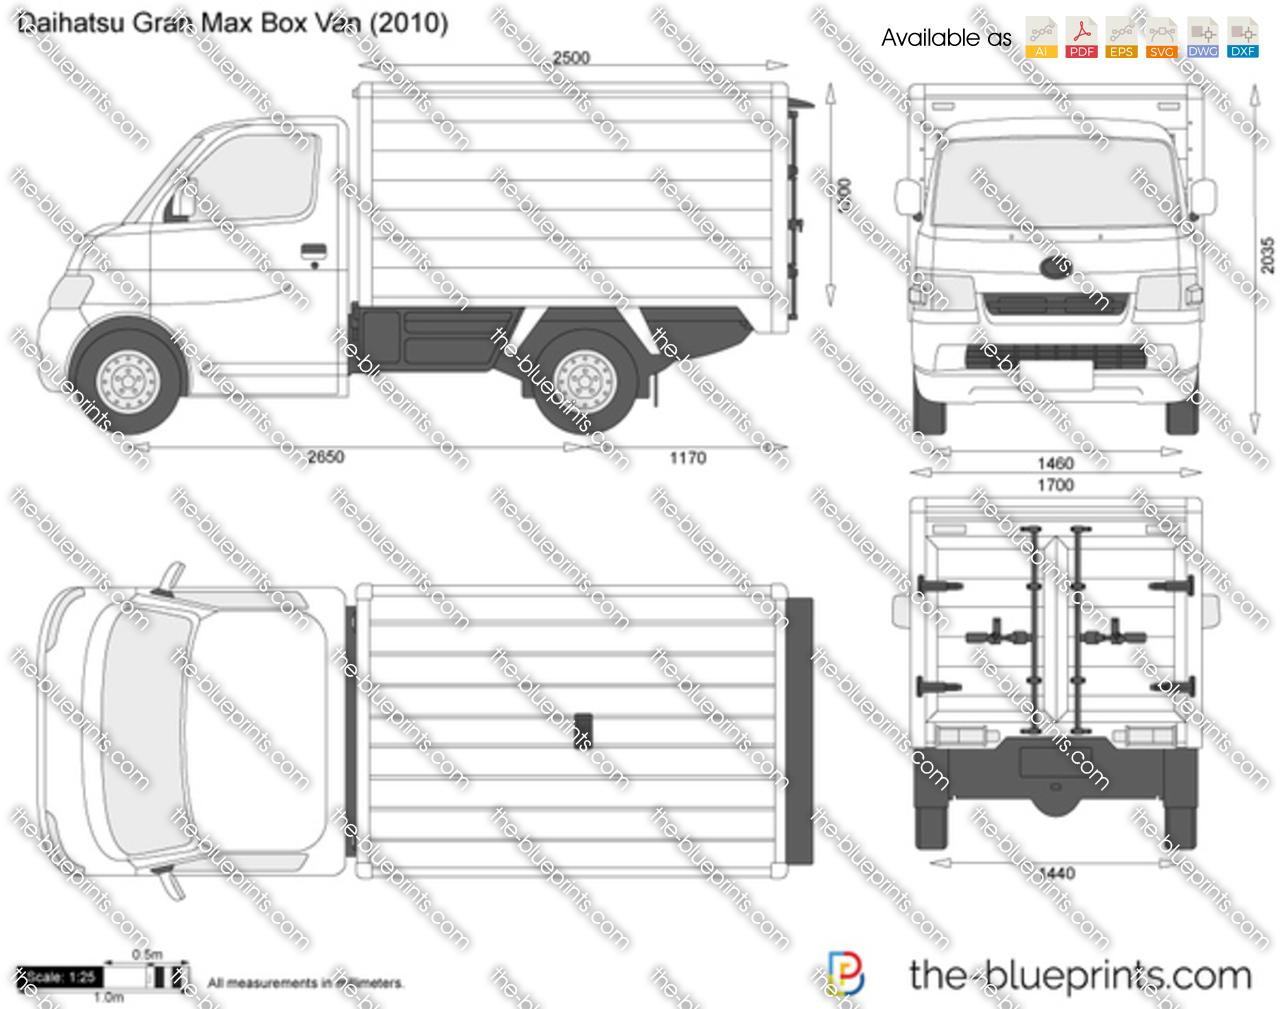 Daihatsu Gran Max Box Van